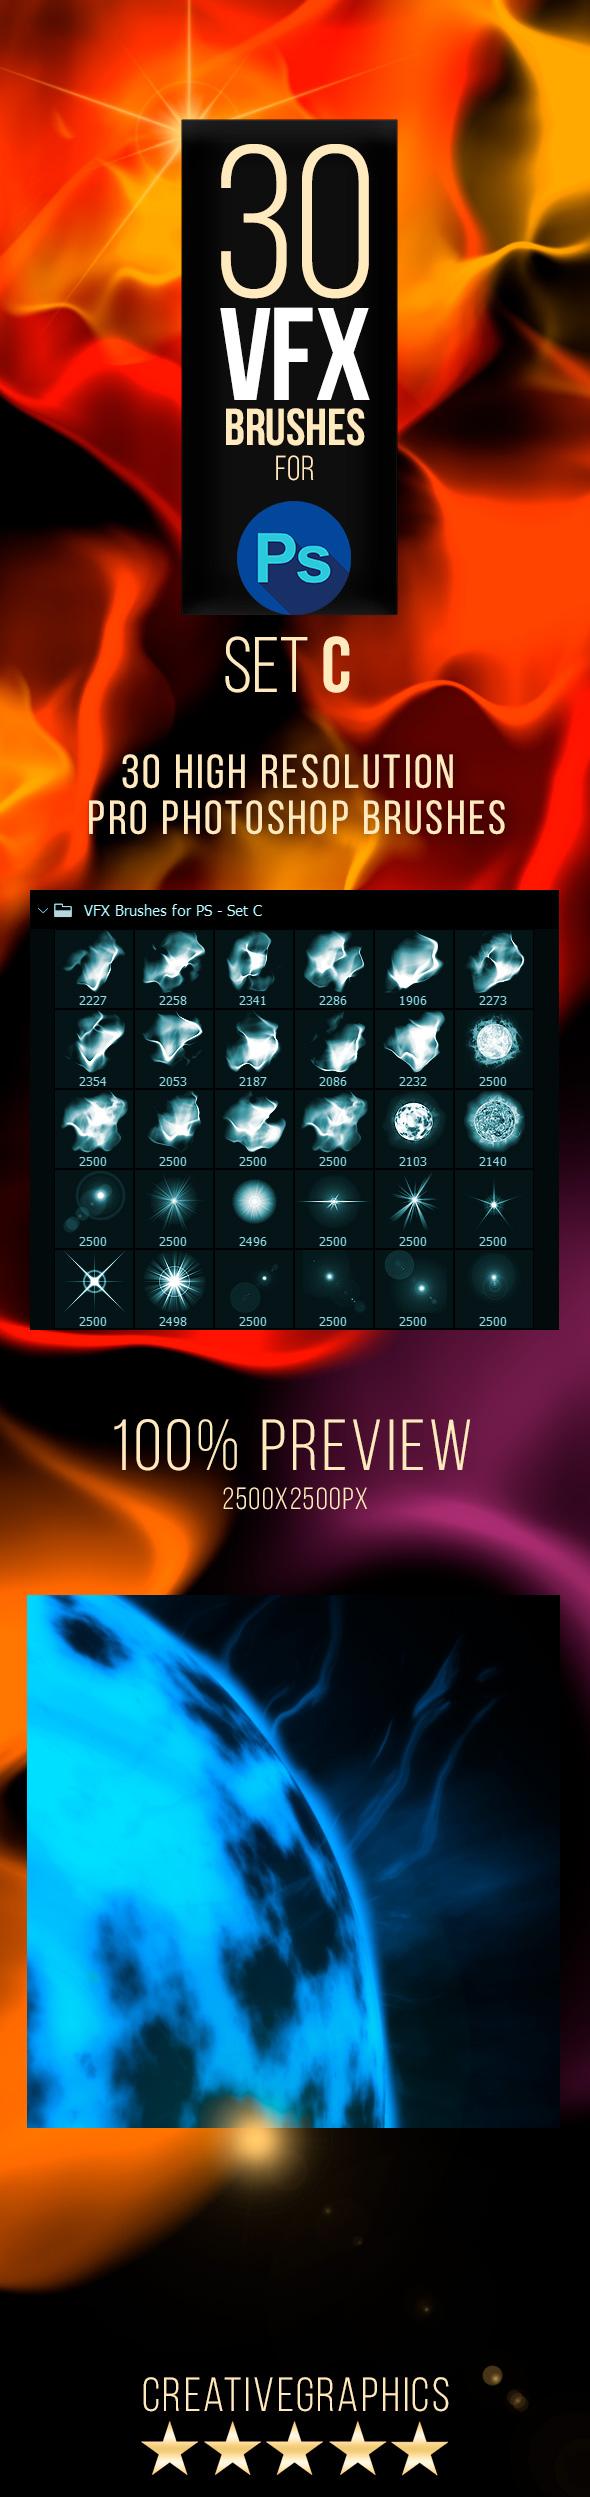 30 Vfx Brushes for Photoshop - Set C - Abstract Brushes